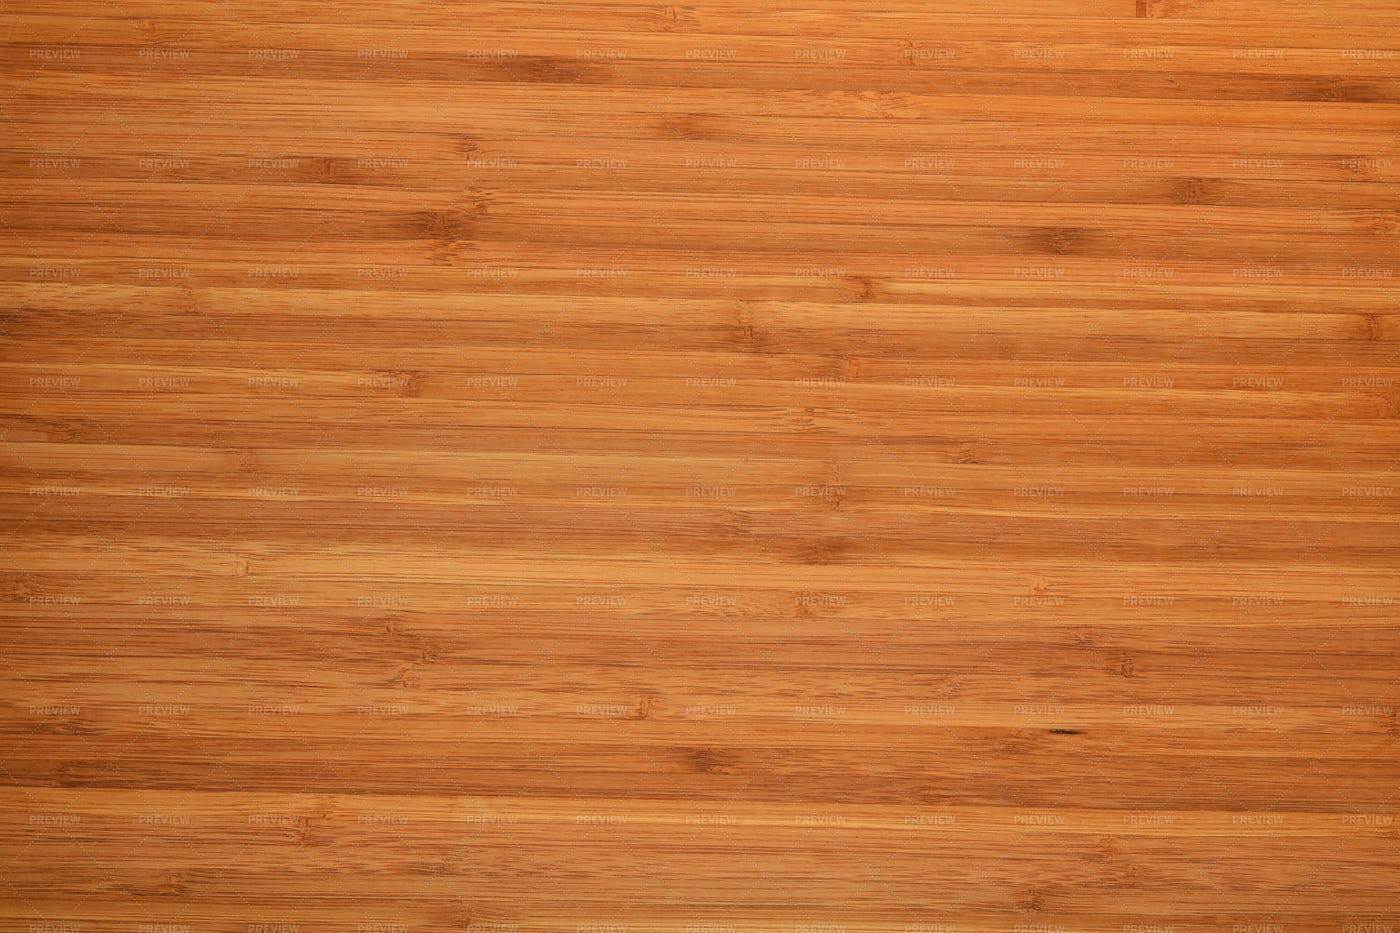 Bamboo Cutting Board: Stock Photos